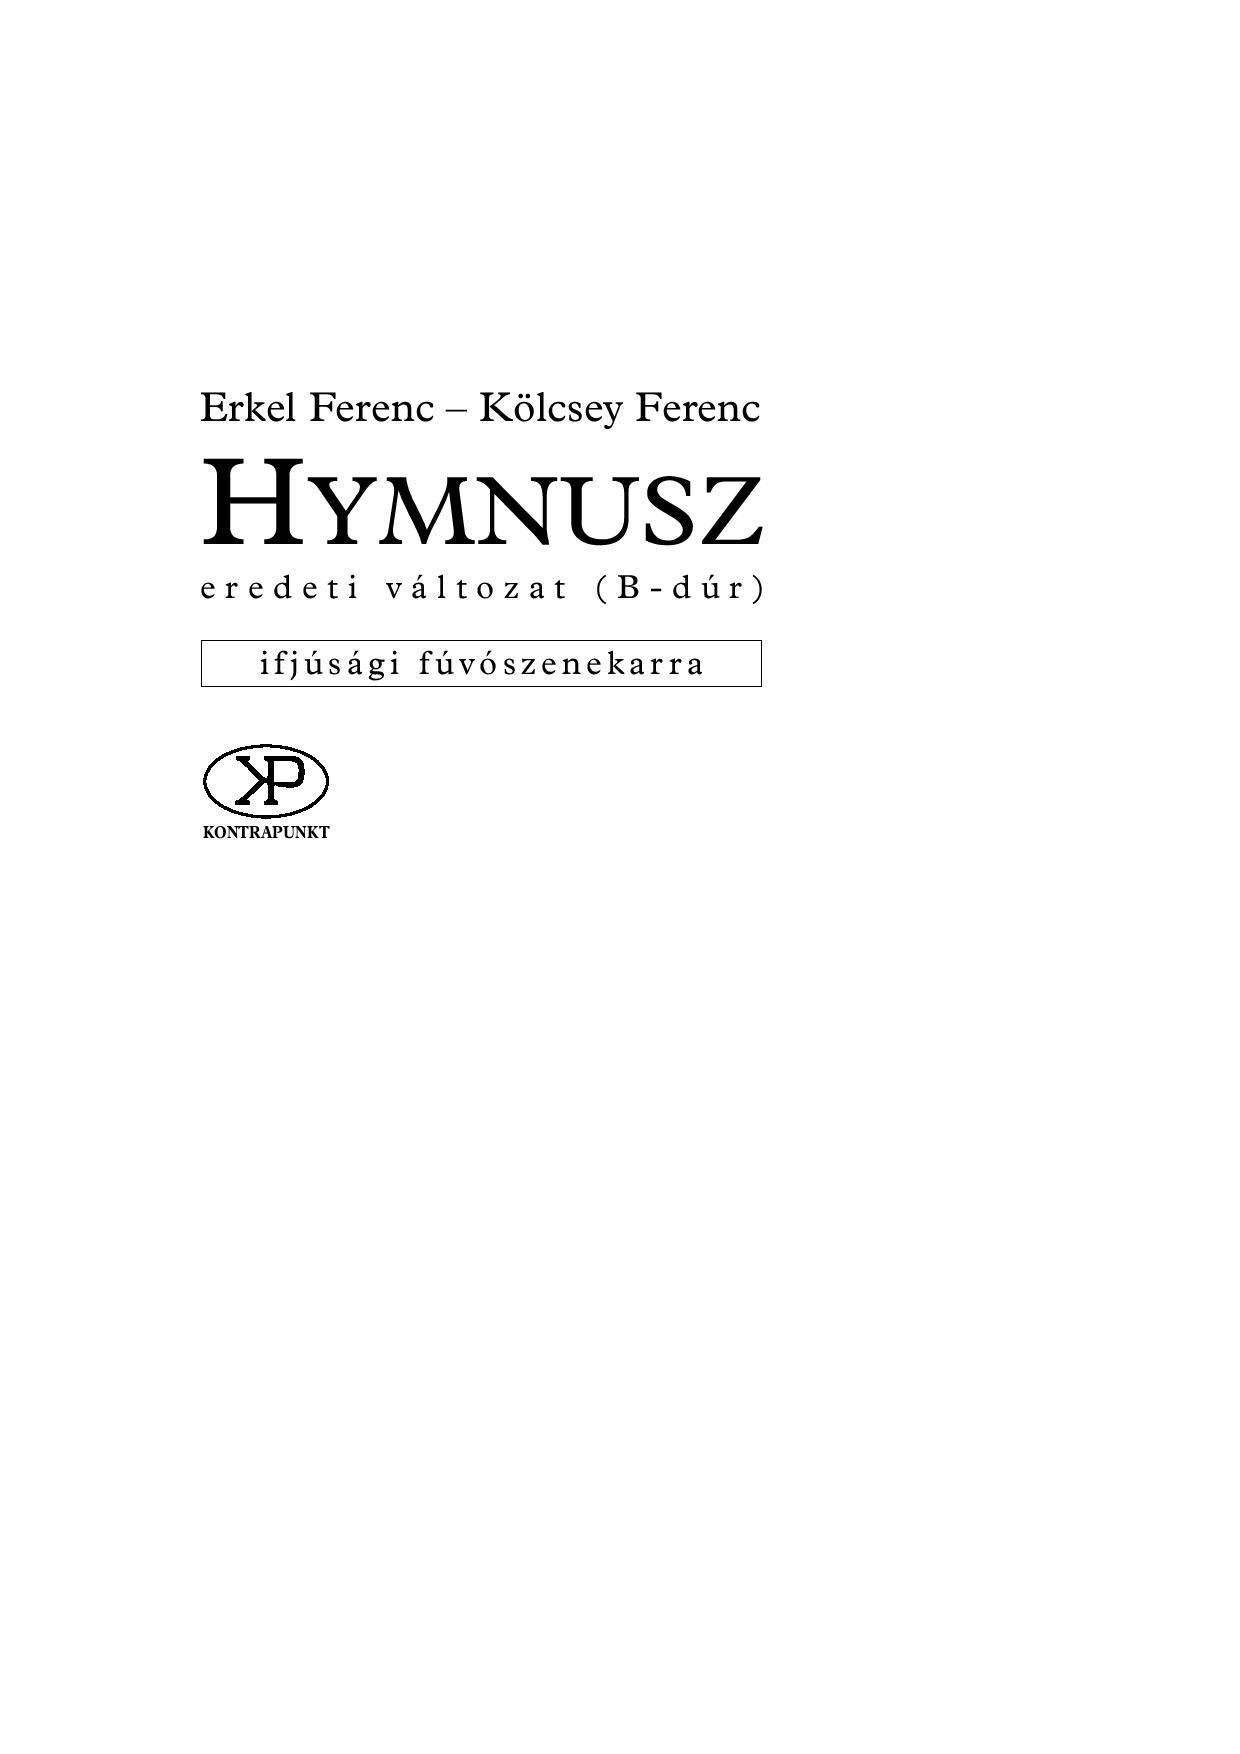 K-0519_Himnusz_ifj_fuvos-B_PARTITURA-page-001